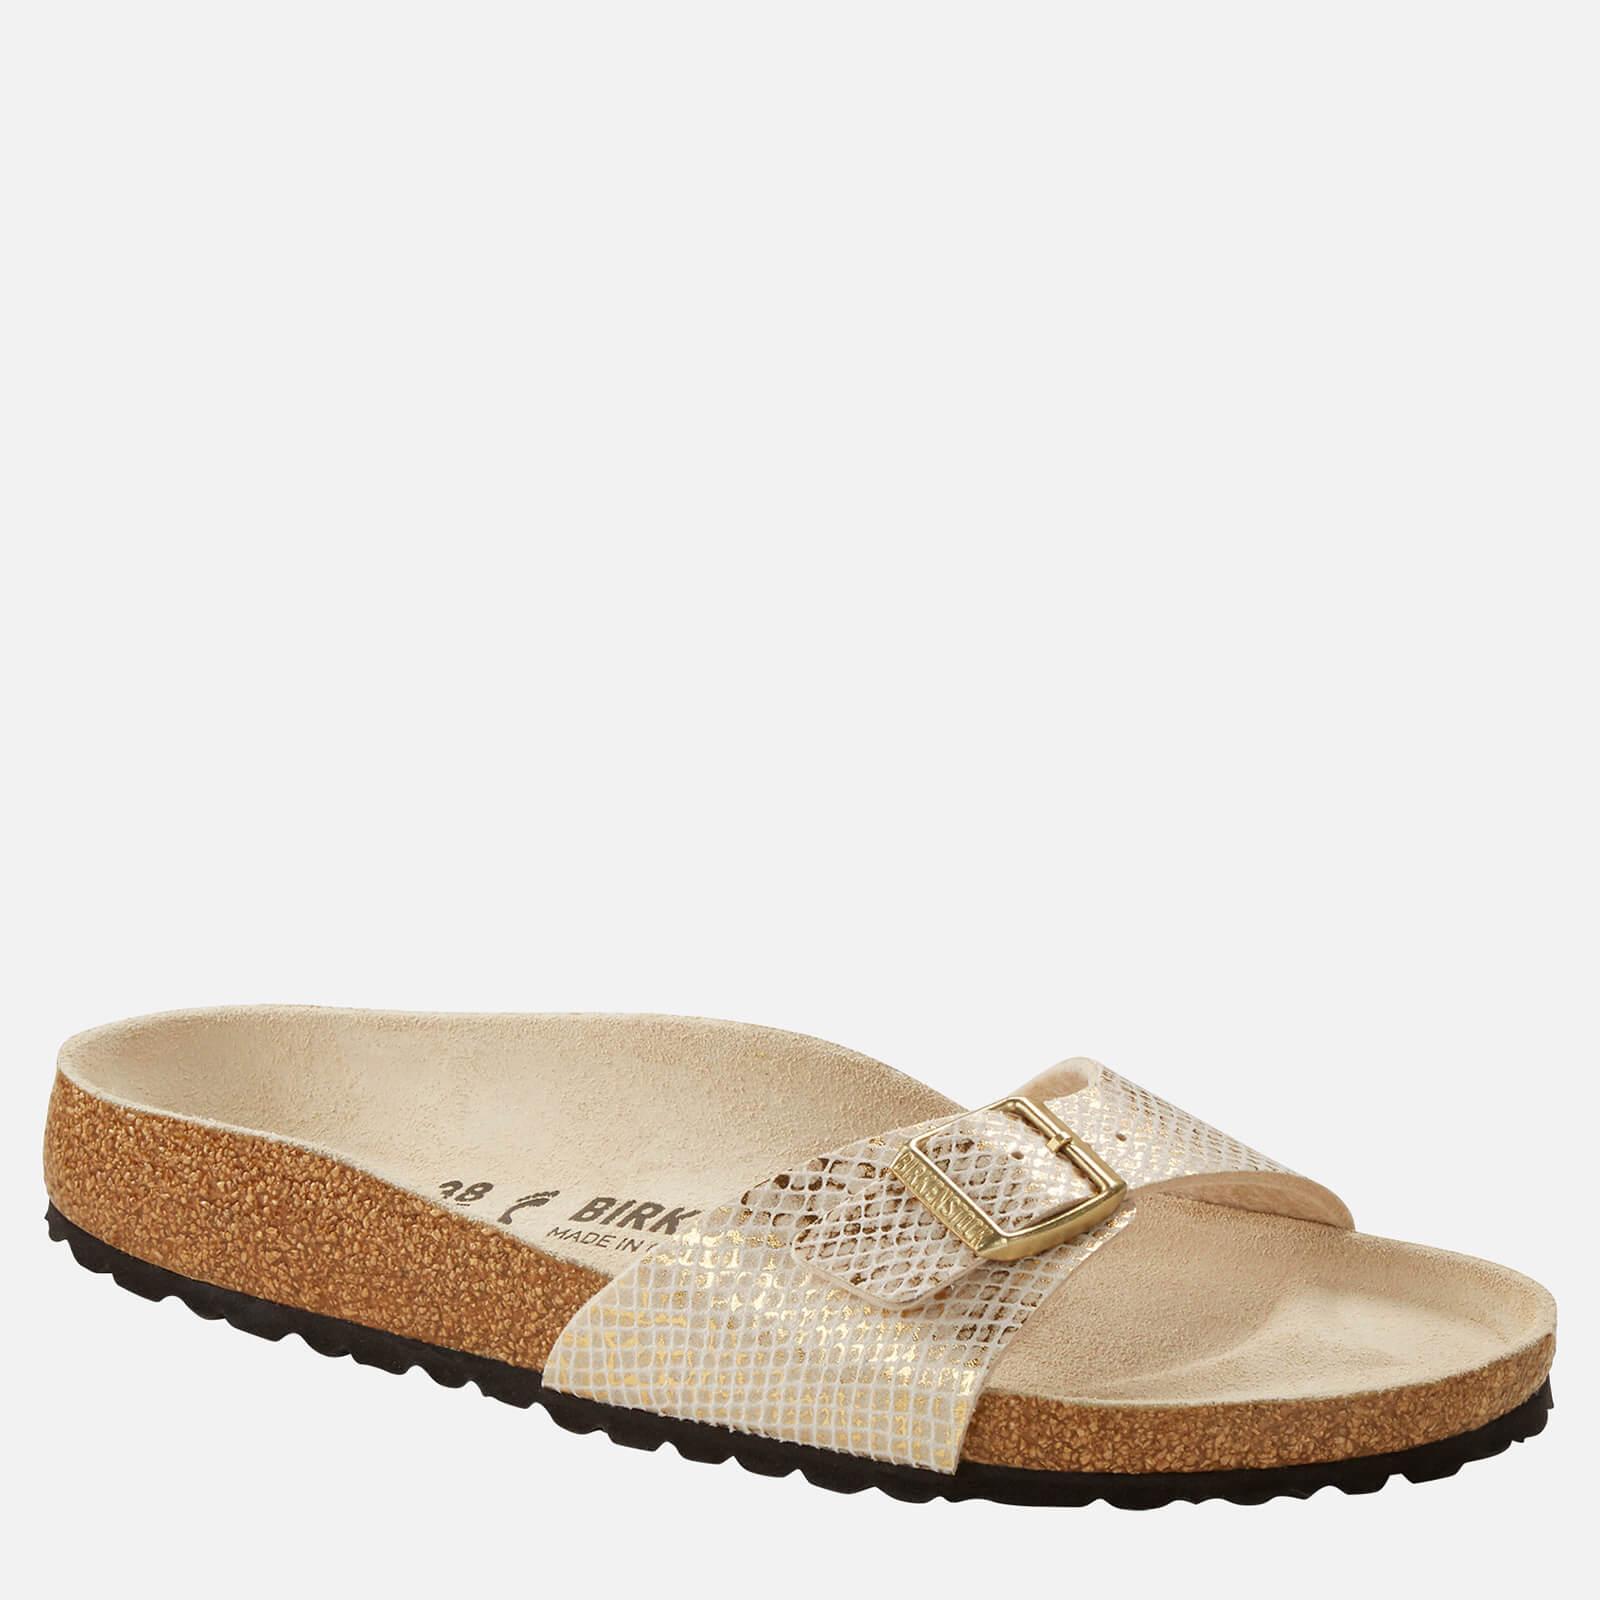 Birkenstock Womens Shiny Python Madrid Single Strap Sandals Eggshell Gold Eu 38 Uk 5